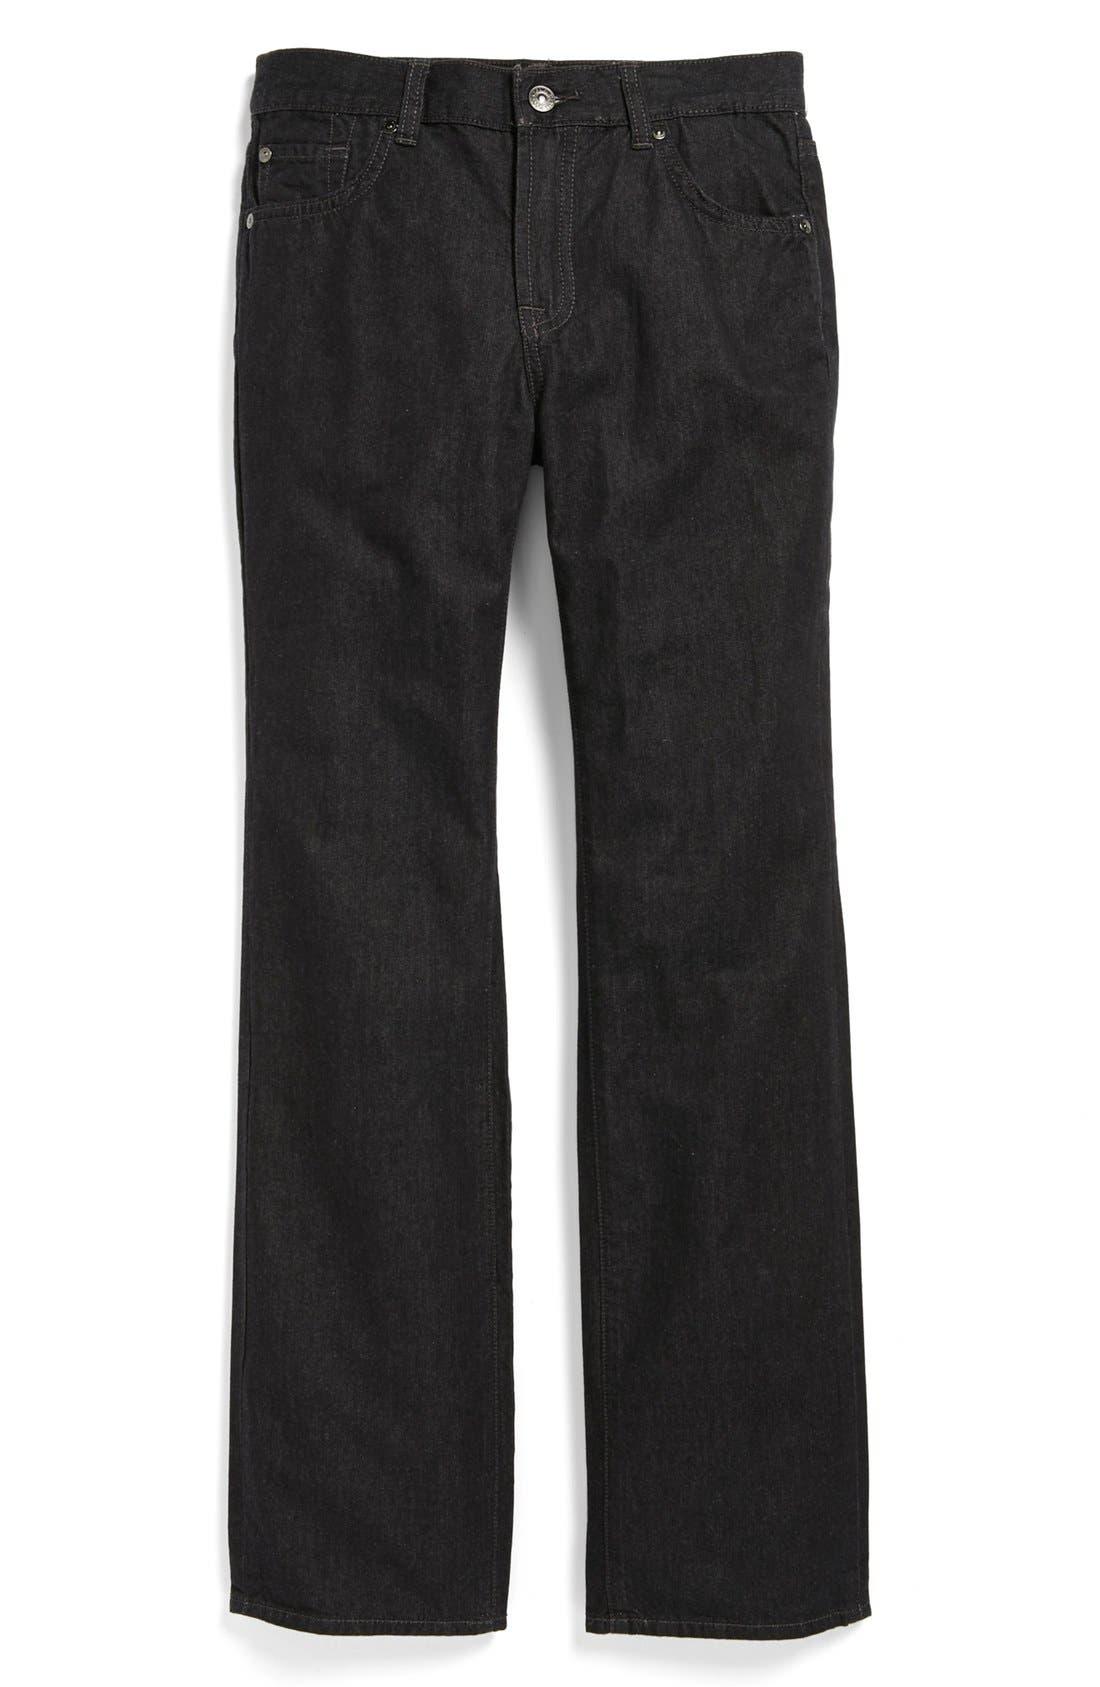 Alternate Image 2  - 7 For All Mankind® 'Standard' Straight Leg Jeans (Big Boys)